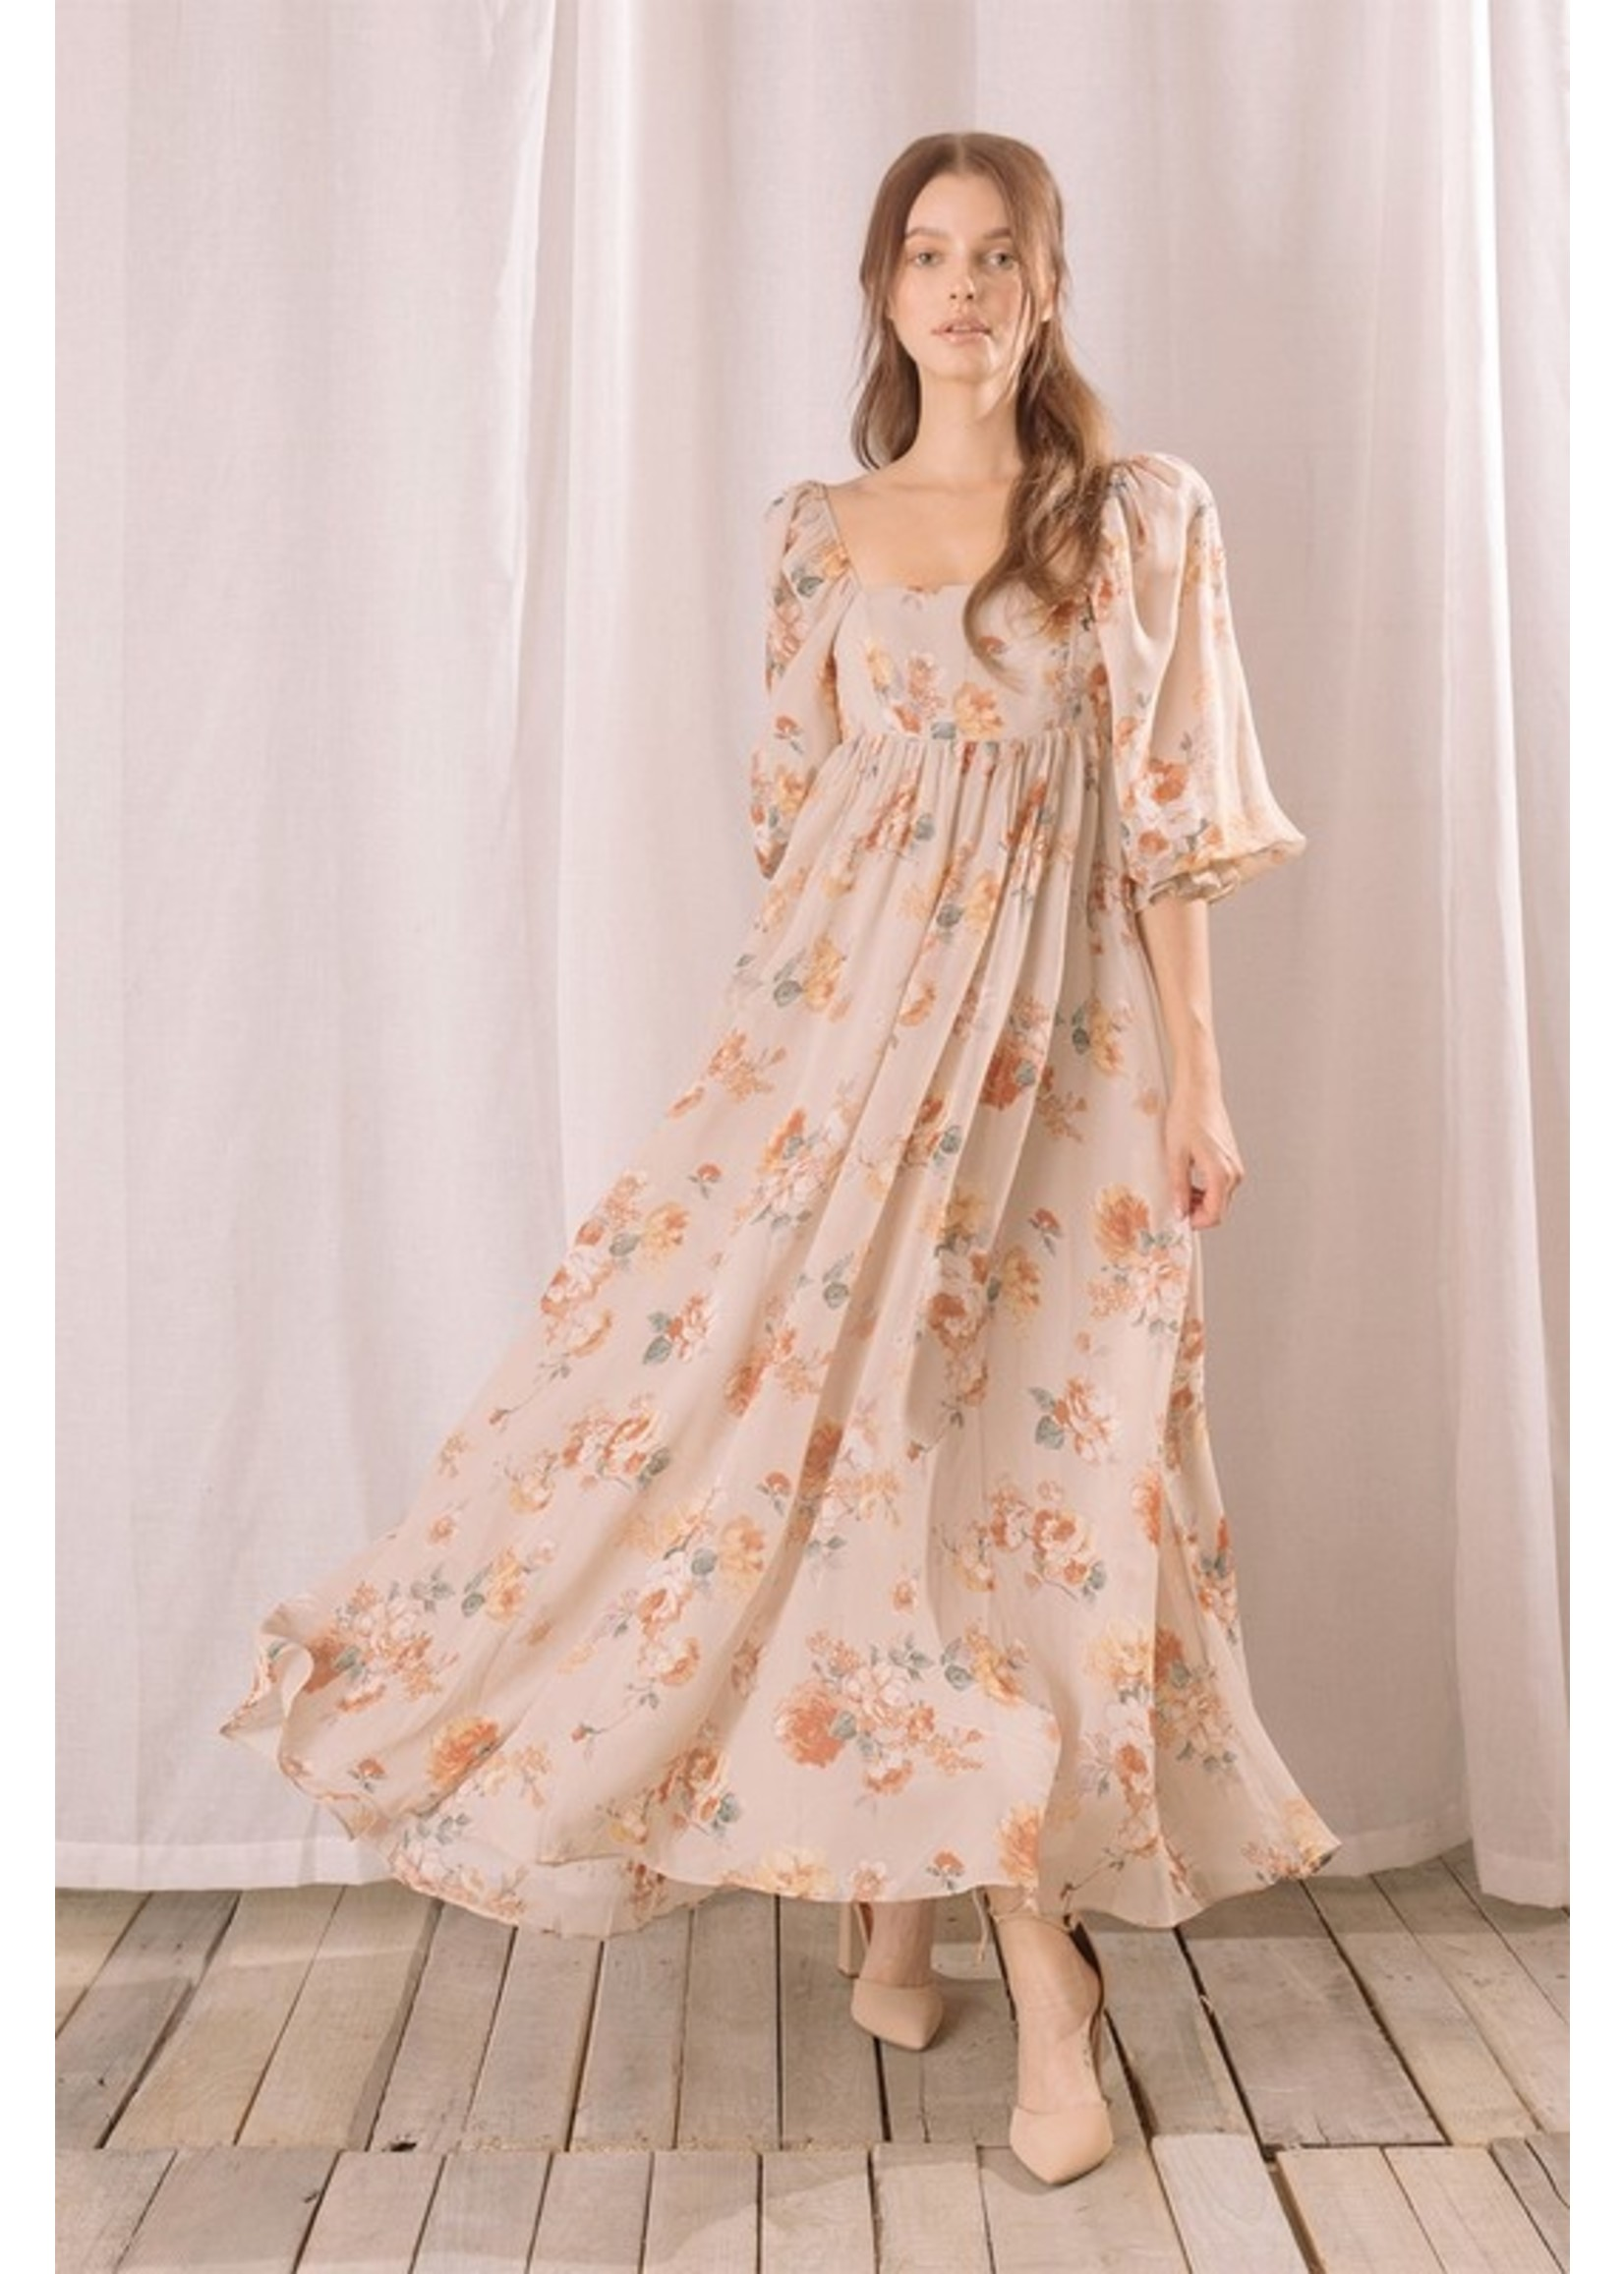 Storia Floral Print Babydoll Maxi Dress - JD2838G